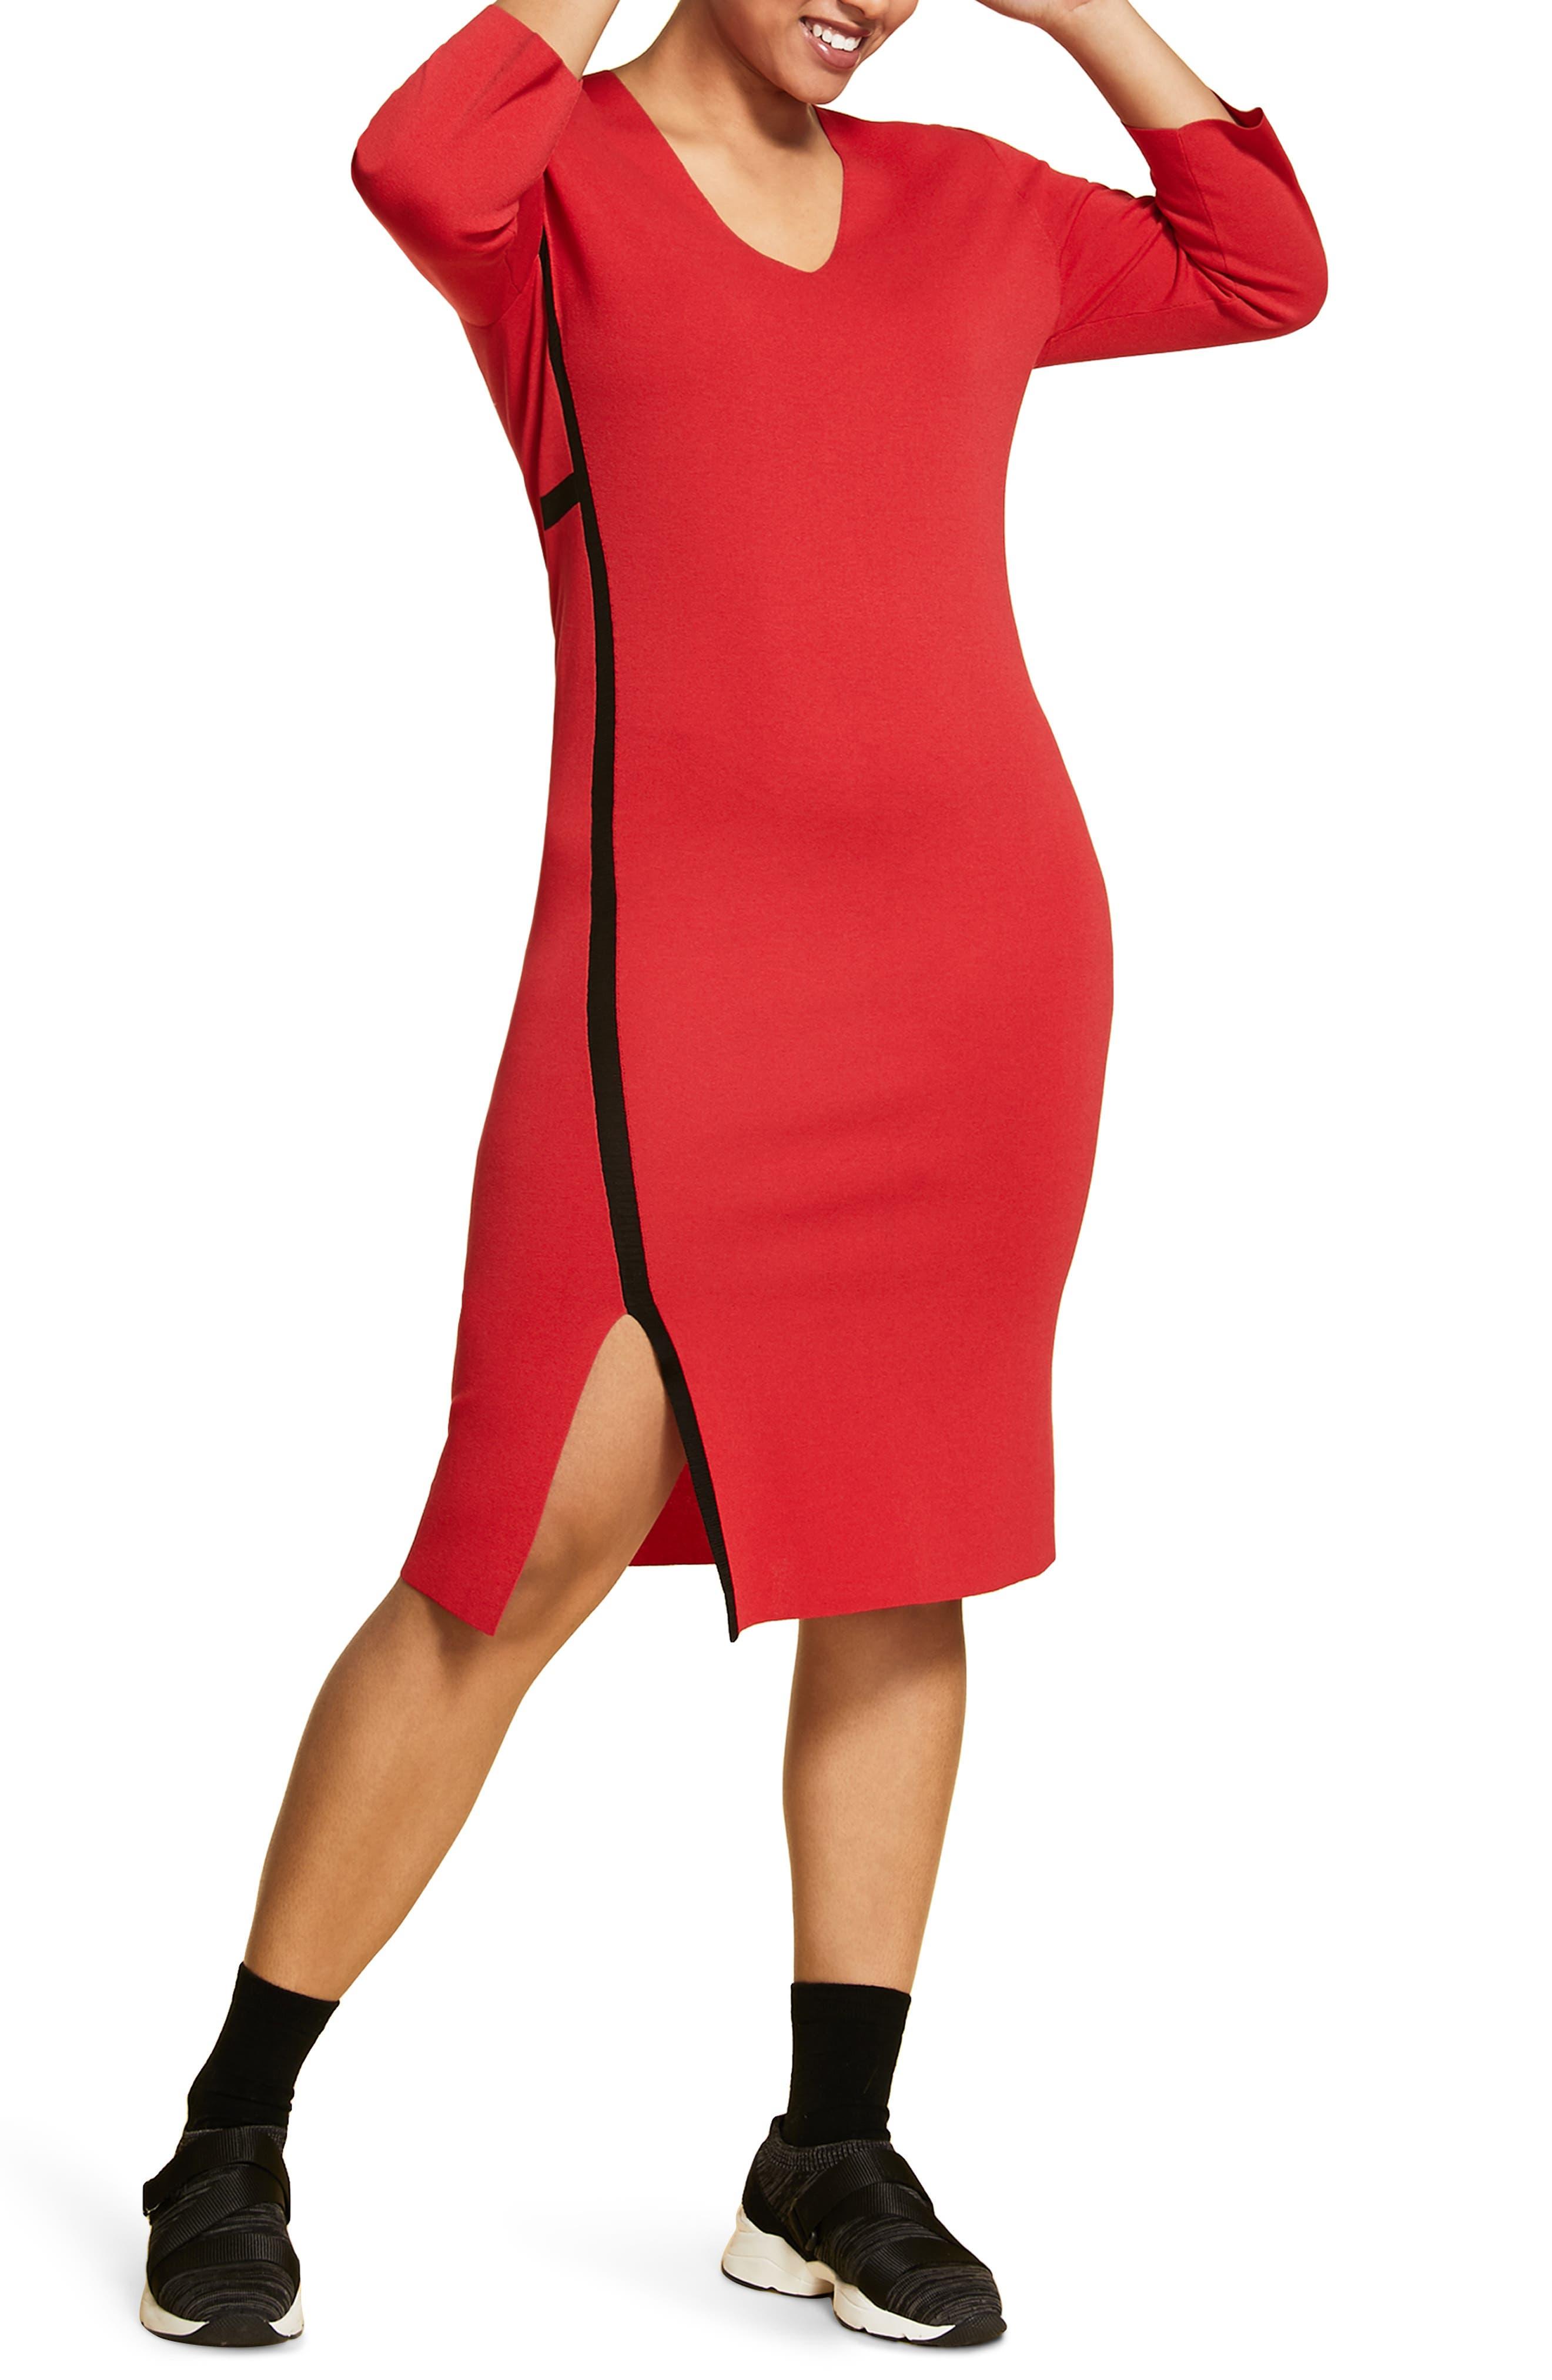 Plus Size Marina Rinaldi Giove Long Sleeve Sweater Dress, Red